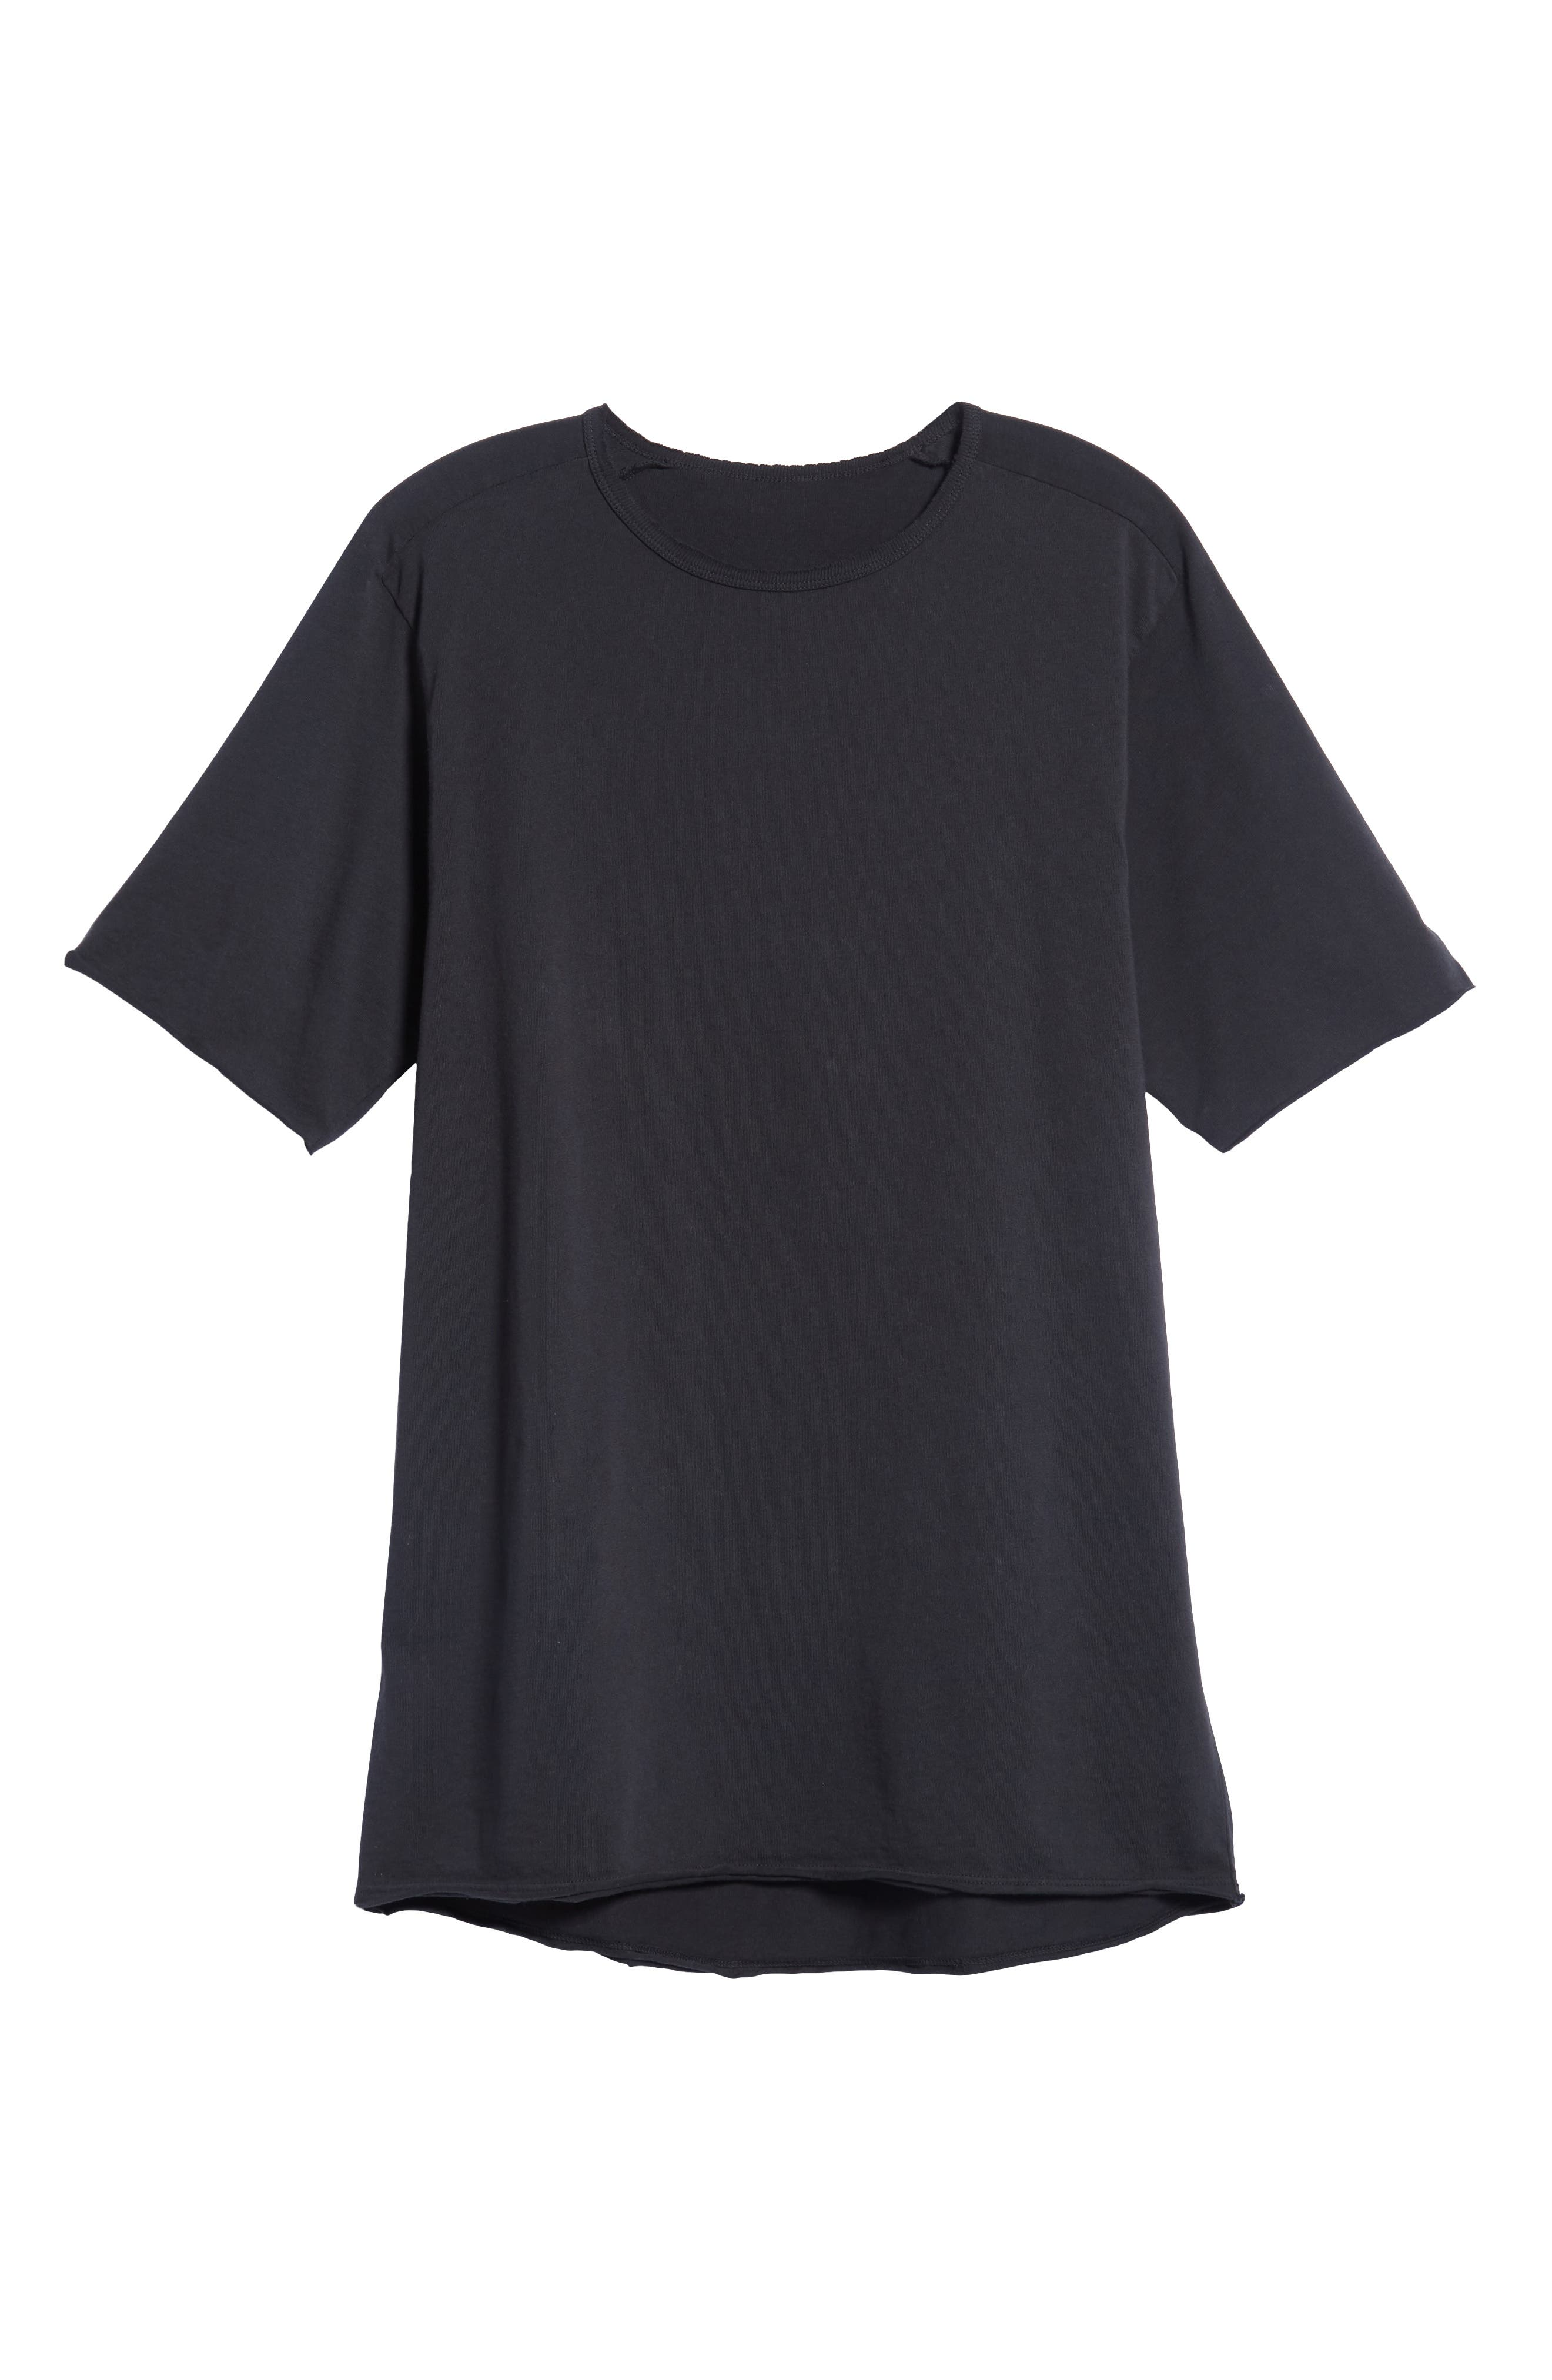 Regular Fit Elongated T-Shirt,                             Alternate thumbnail 6, color,                             BLACK